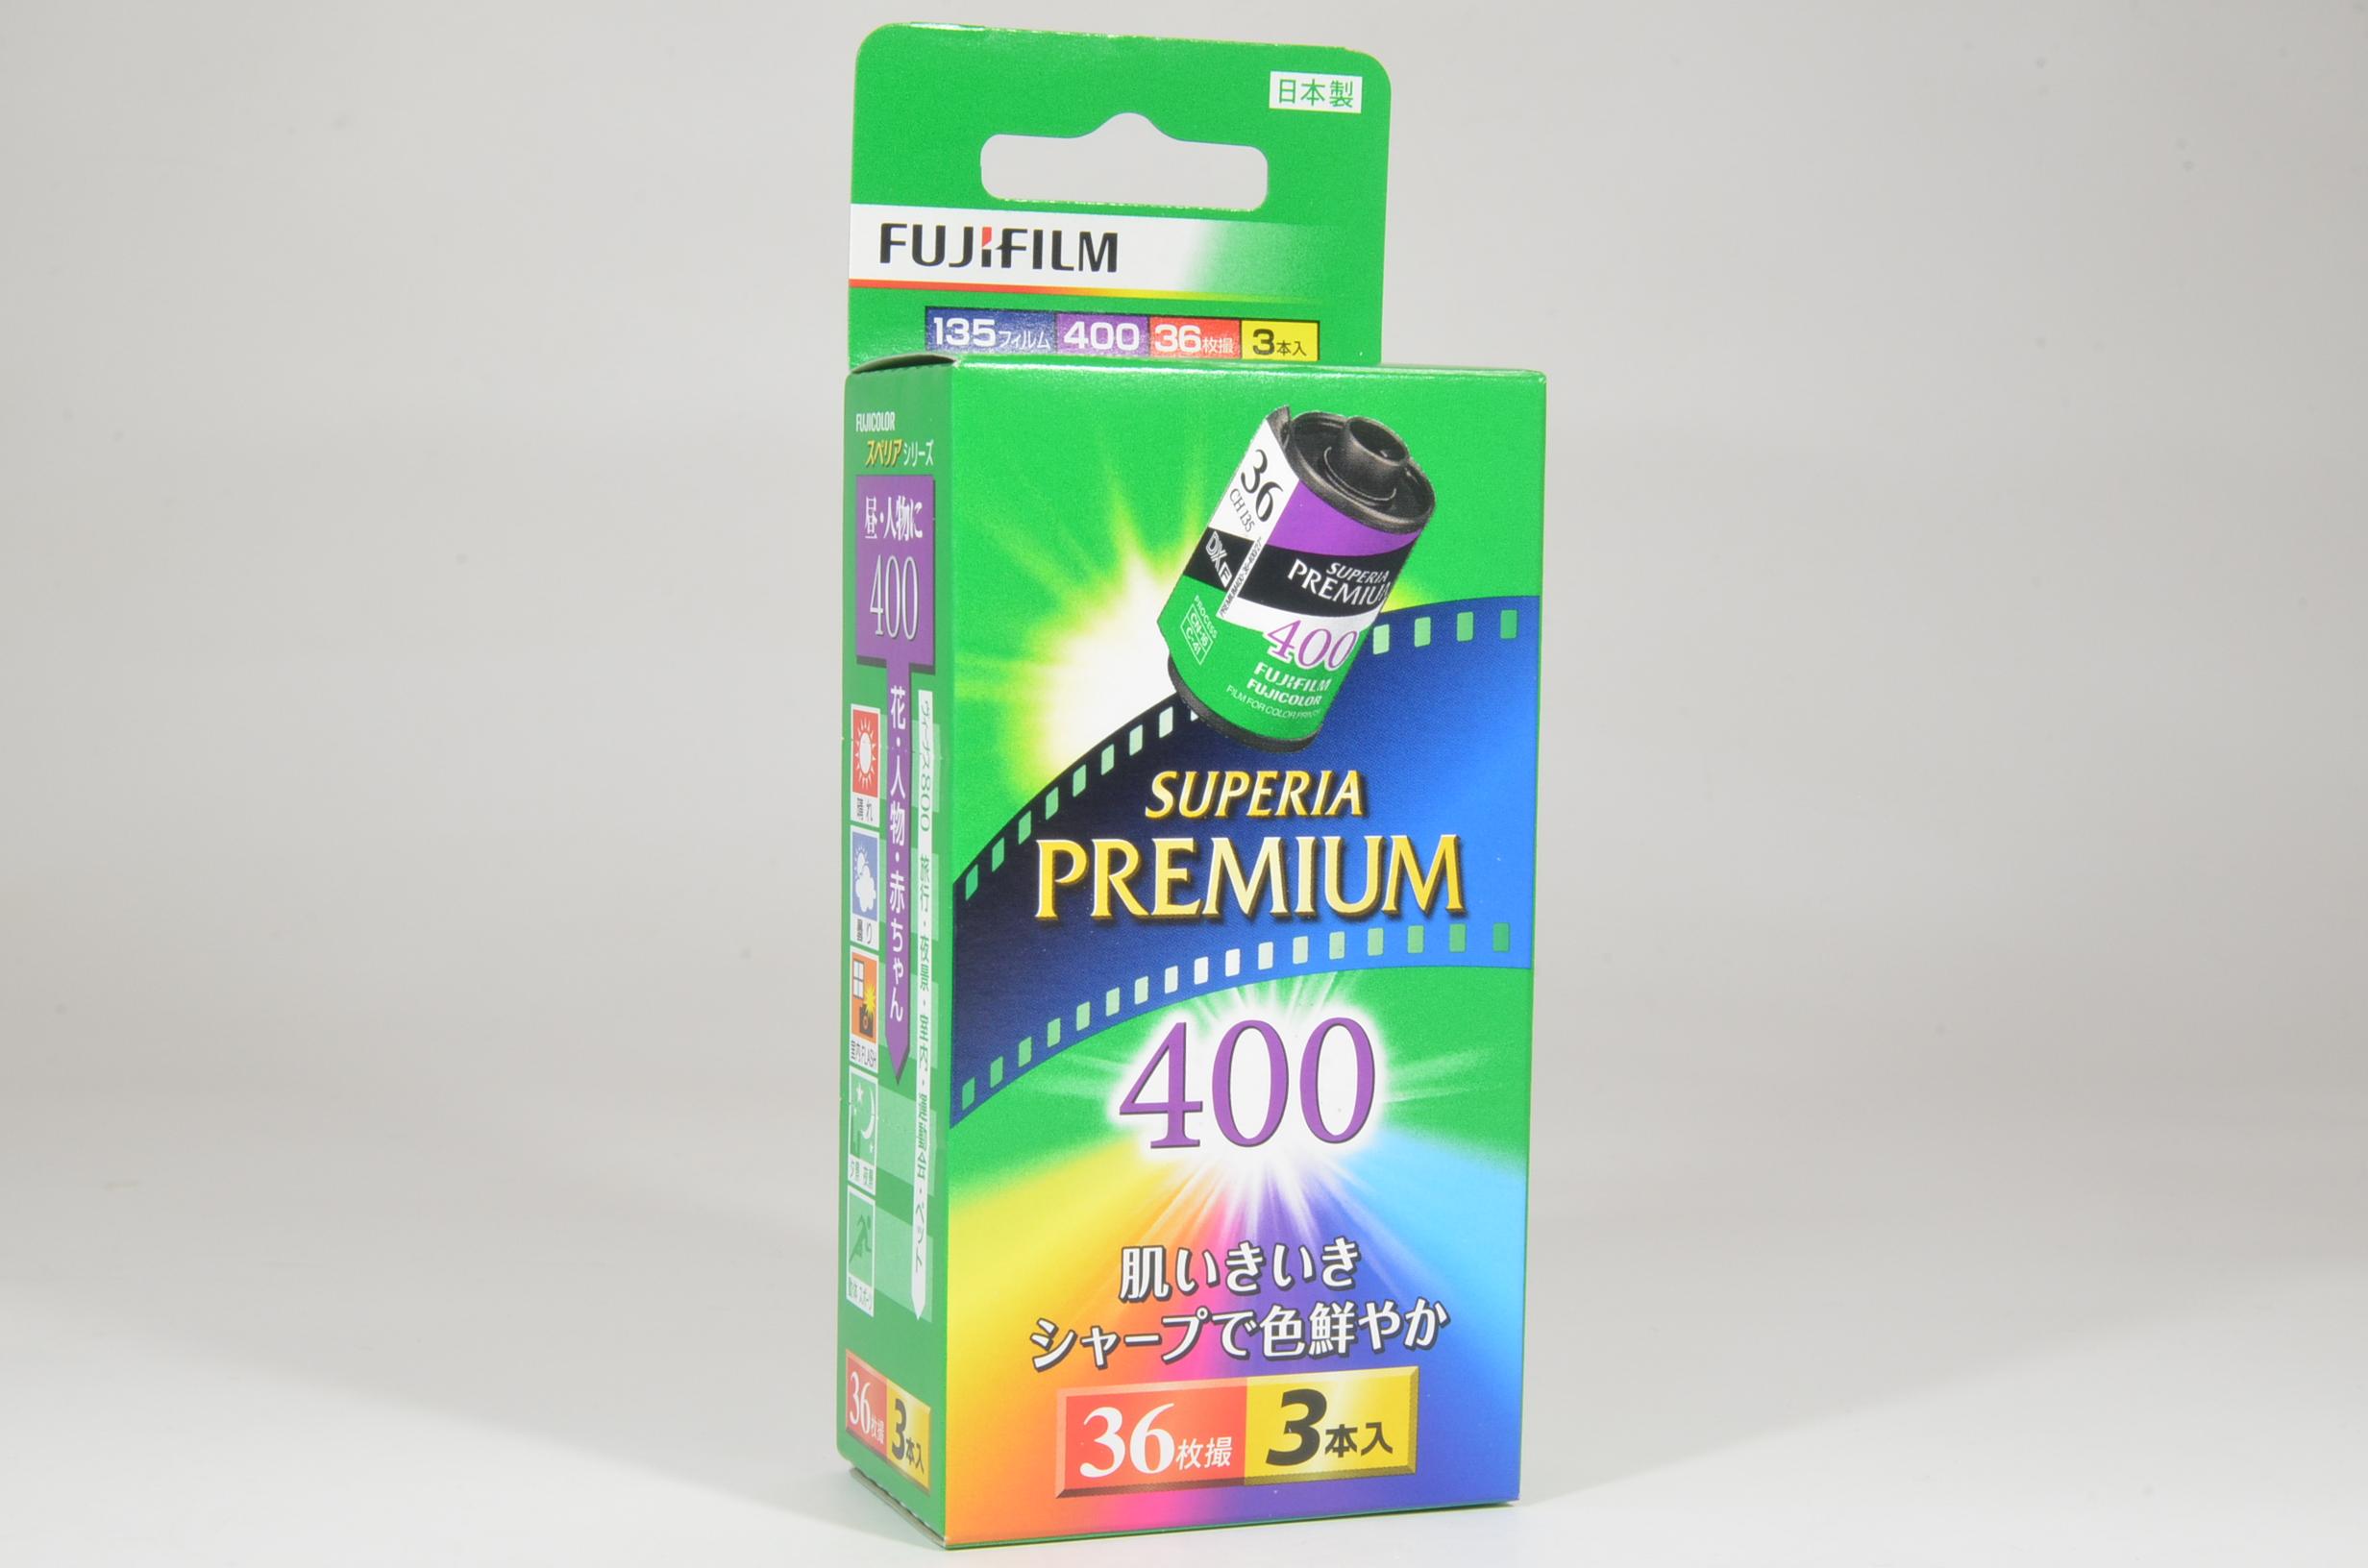 fujifilm superia premium iso 400 daylight color negative 36 exp 3 rolls